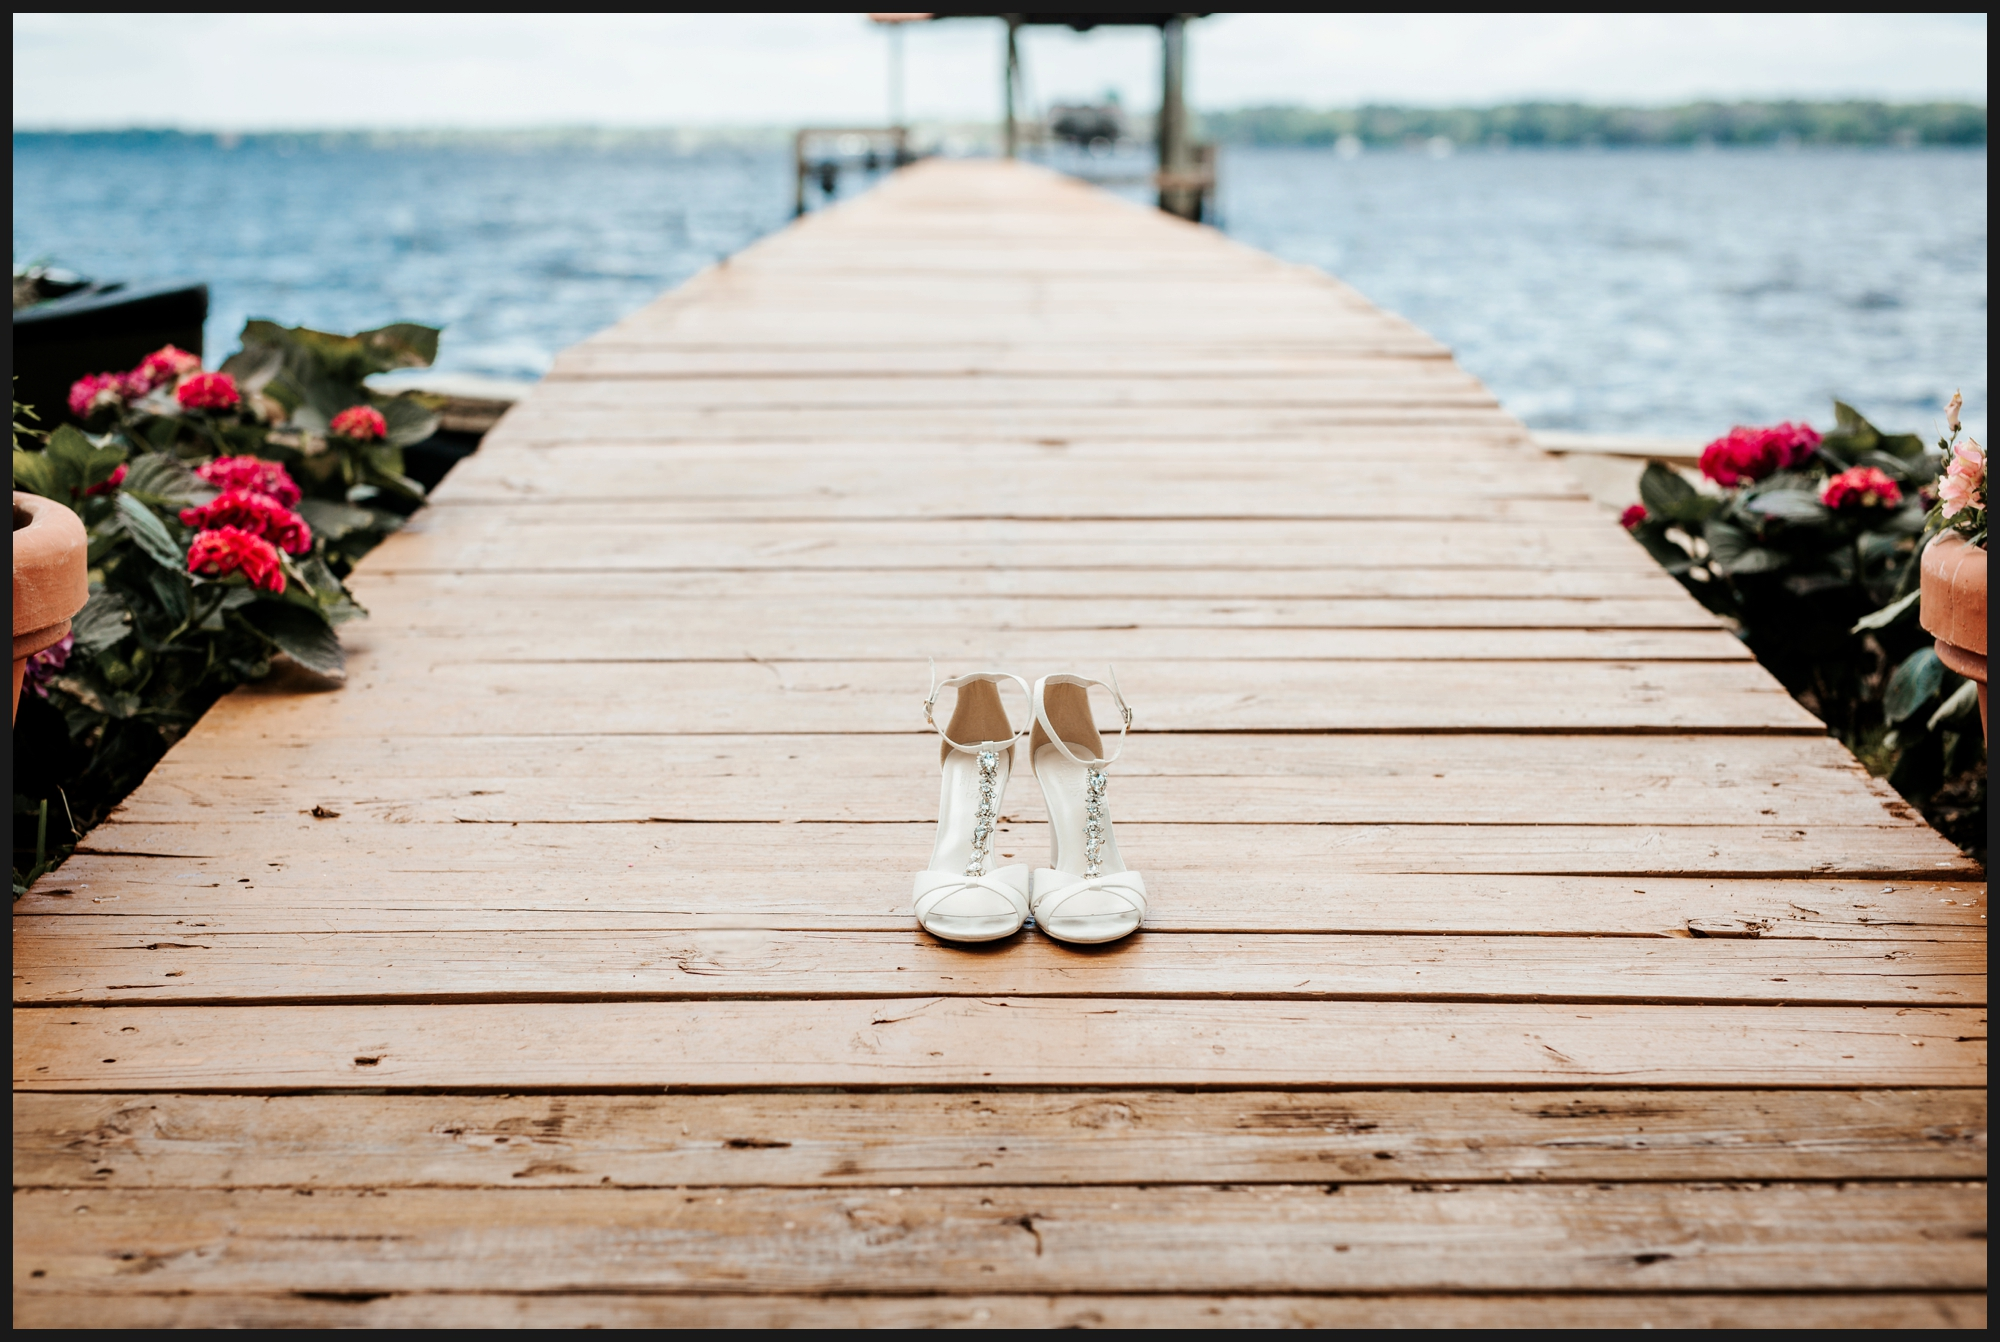 Orlando-Wedding-Photographer-destination-wedding-photographer-florida-wedding-photographer-bohemian-wedding-photographer_1392.jpg